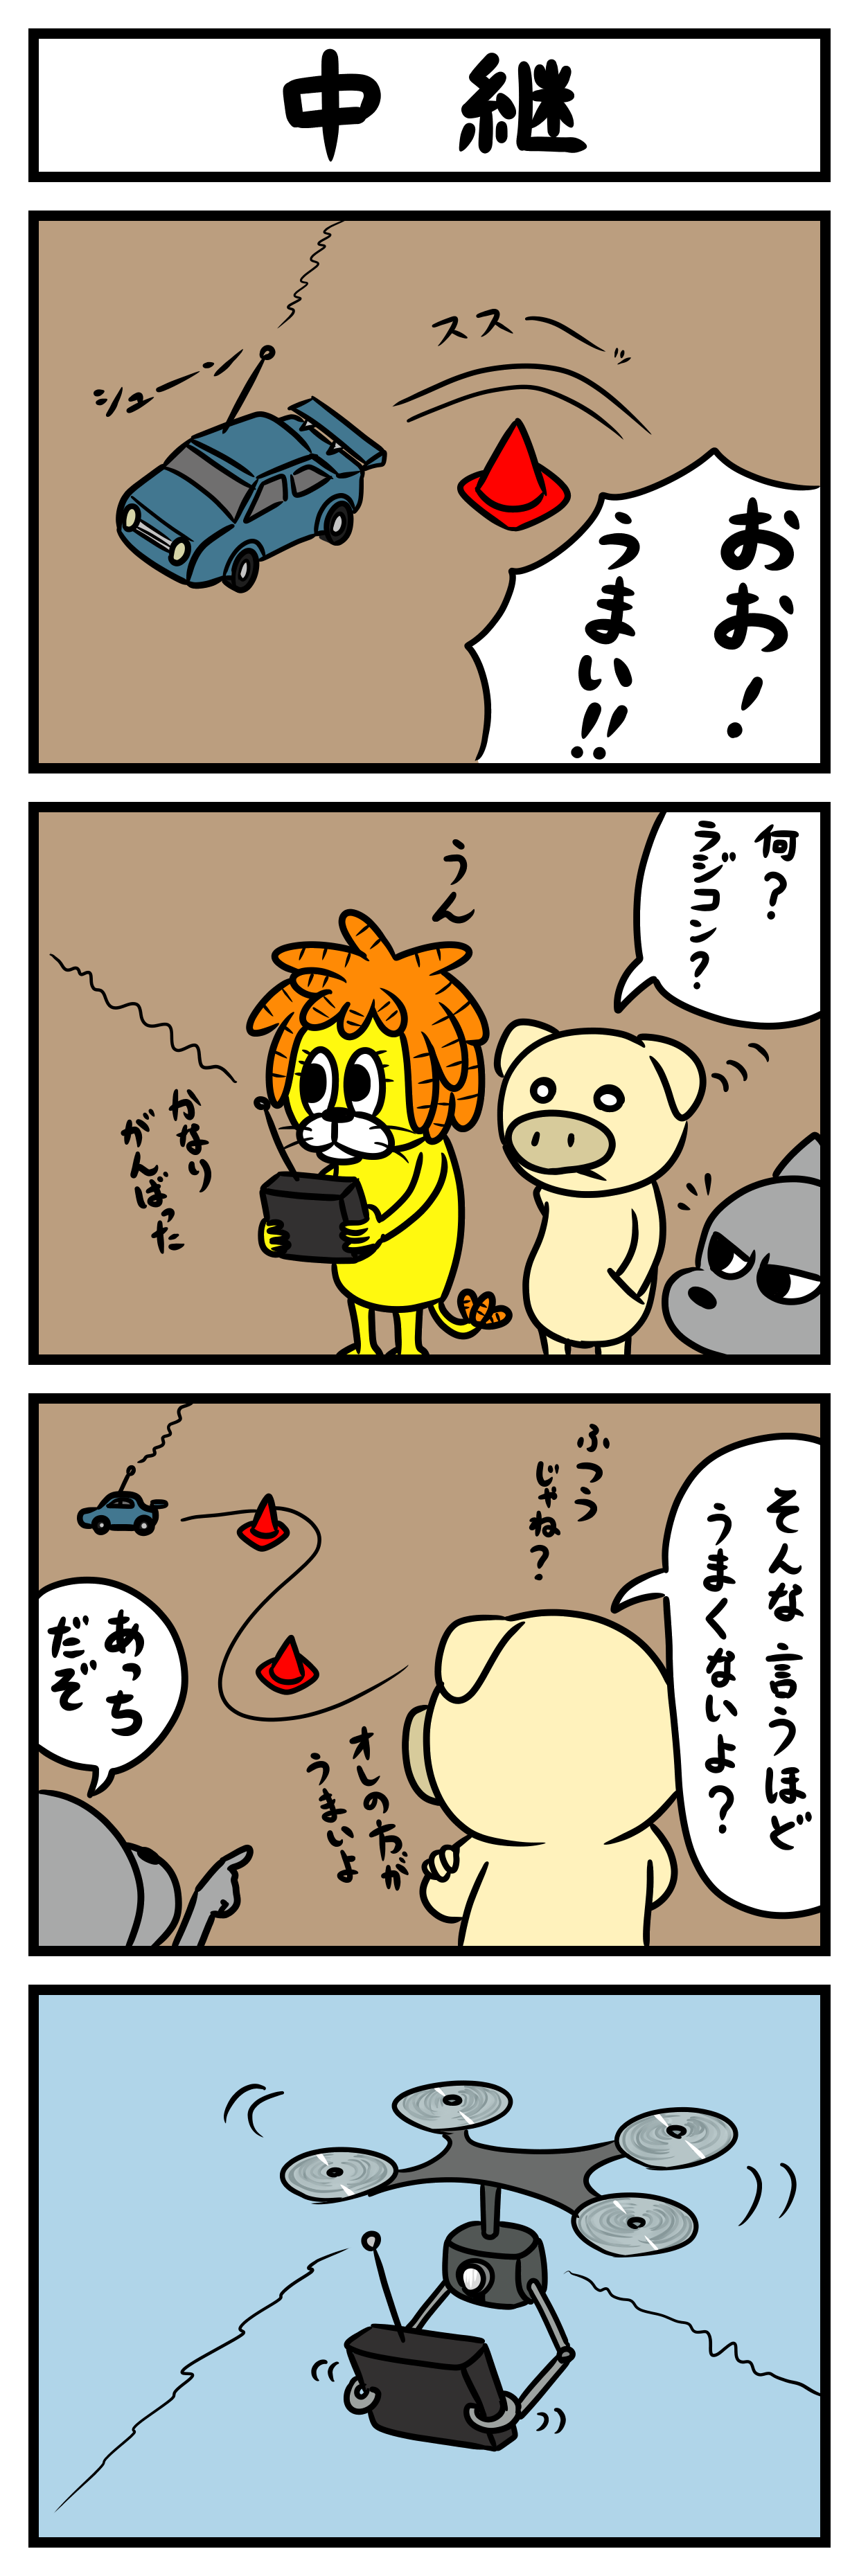 4koma094中継